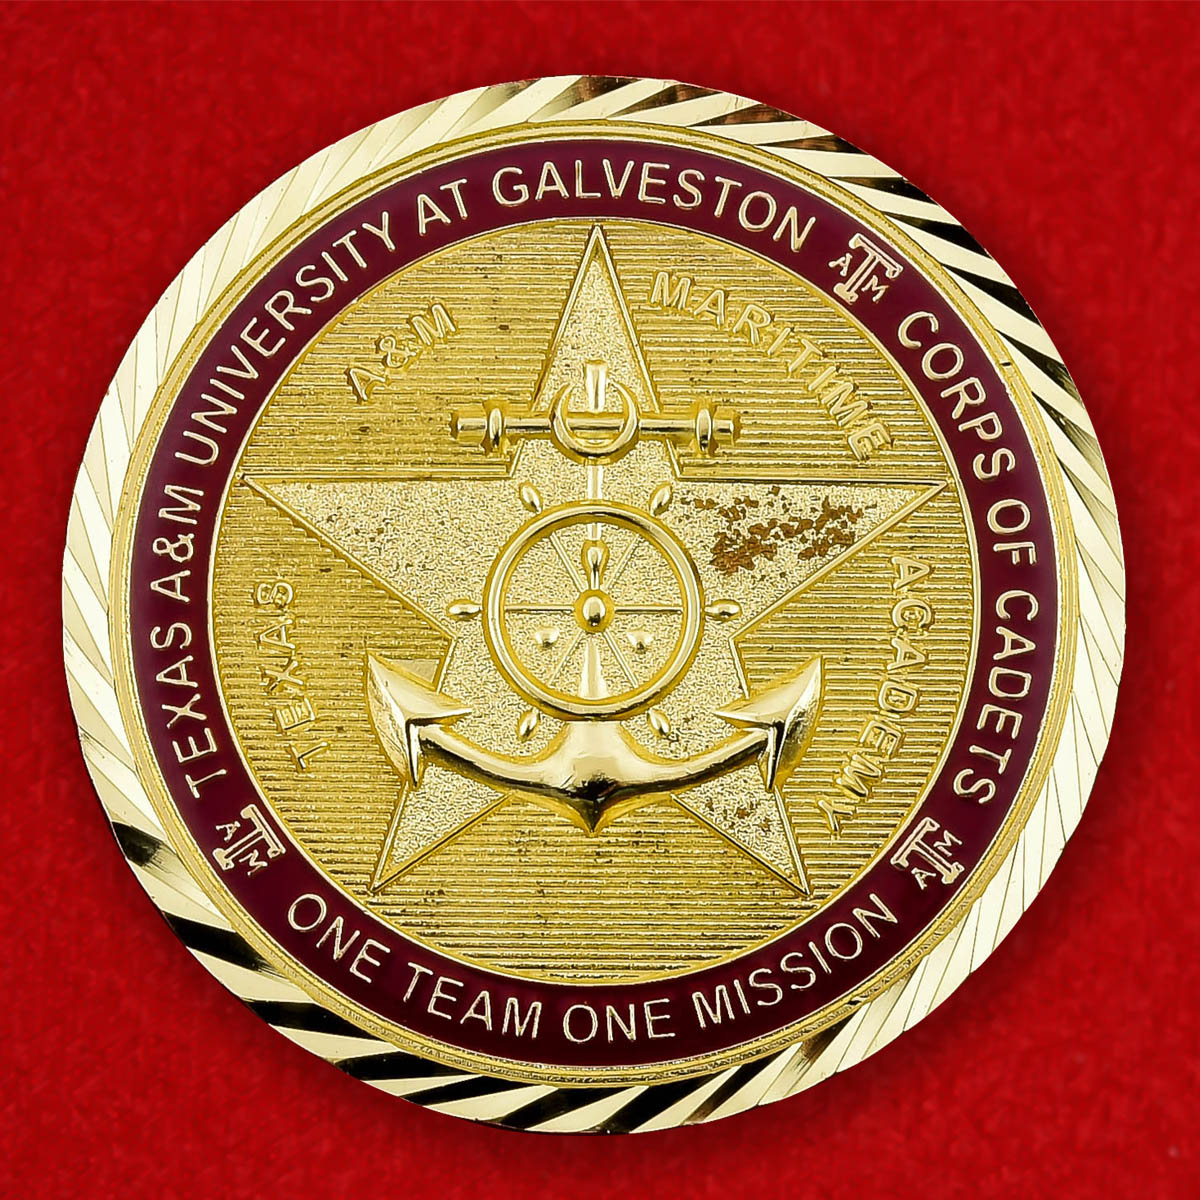 "Челлендж коин ""От начальника Кадетского корпуса Морской академии при Техасском университете A & M Галвестон полковника Ричарда А. Маллена"""